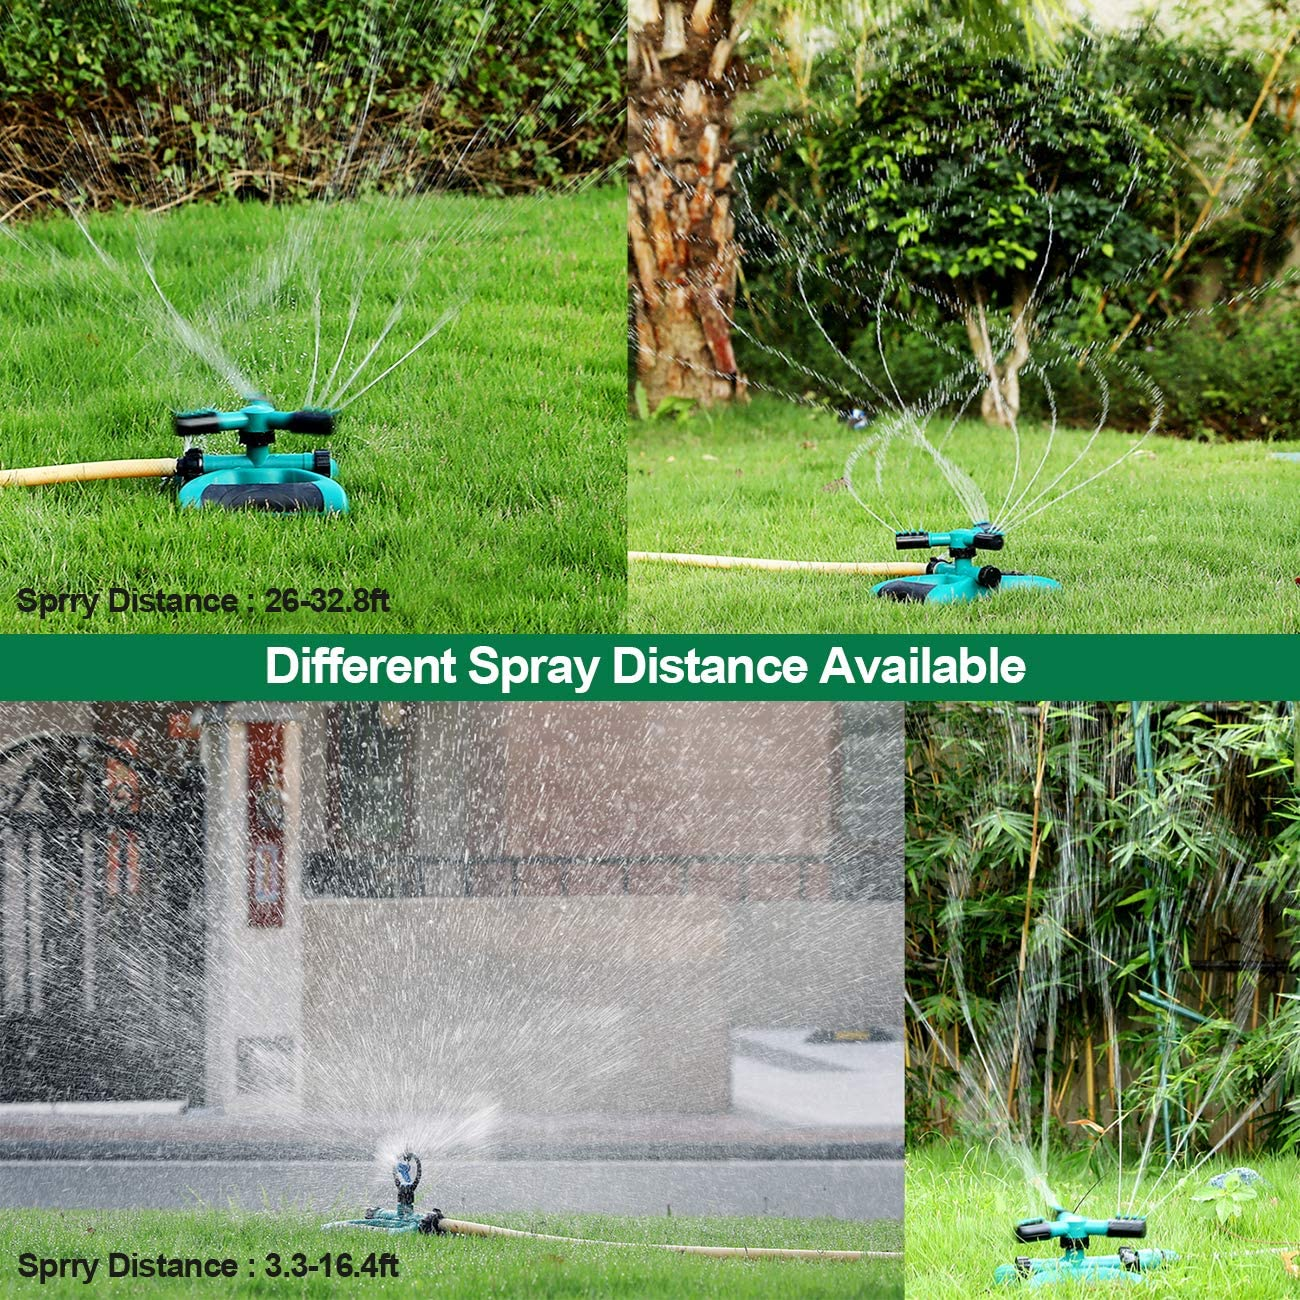 Aspersor de Riego, Sistema Automático de Irrigación de Rociadores de Agua de Jardín de 360 ° con Rociador Redondo de 3 Brazos, Manguera Fácil de Conectar: Amazon.es: Jardín